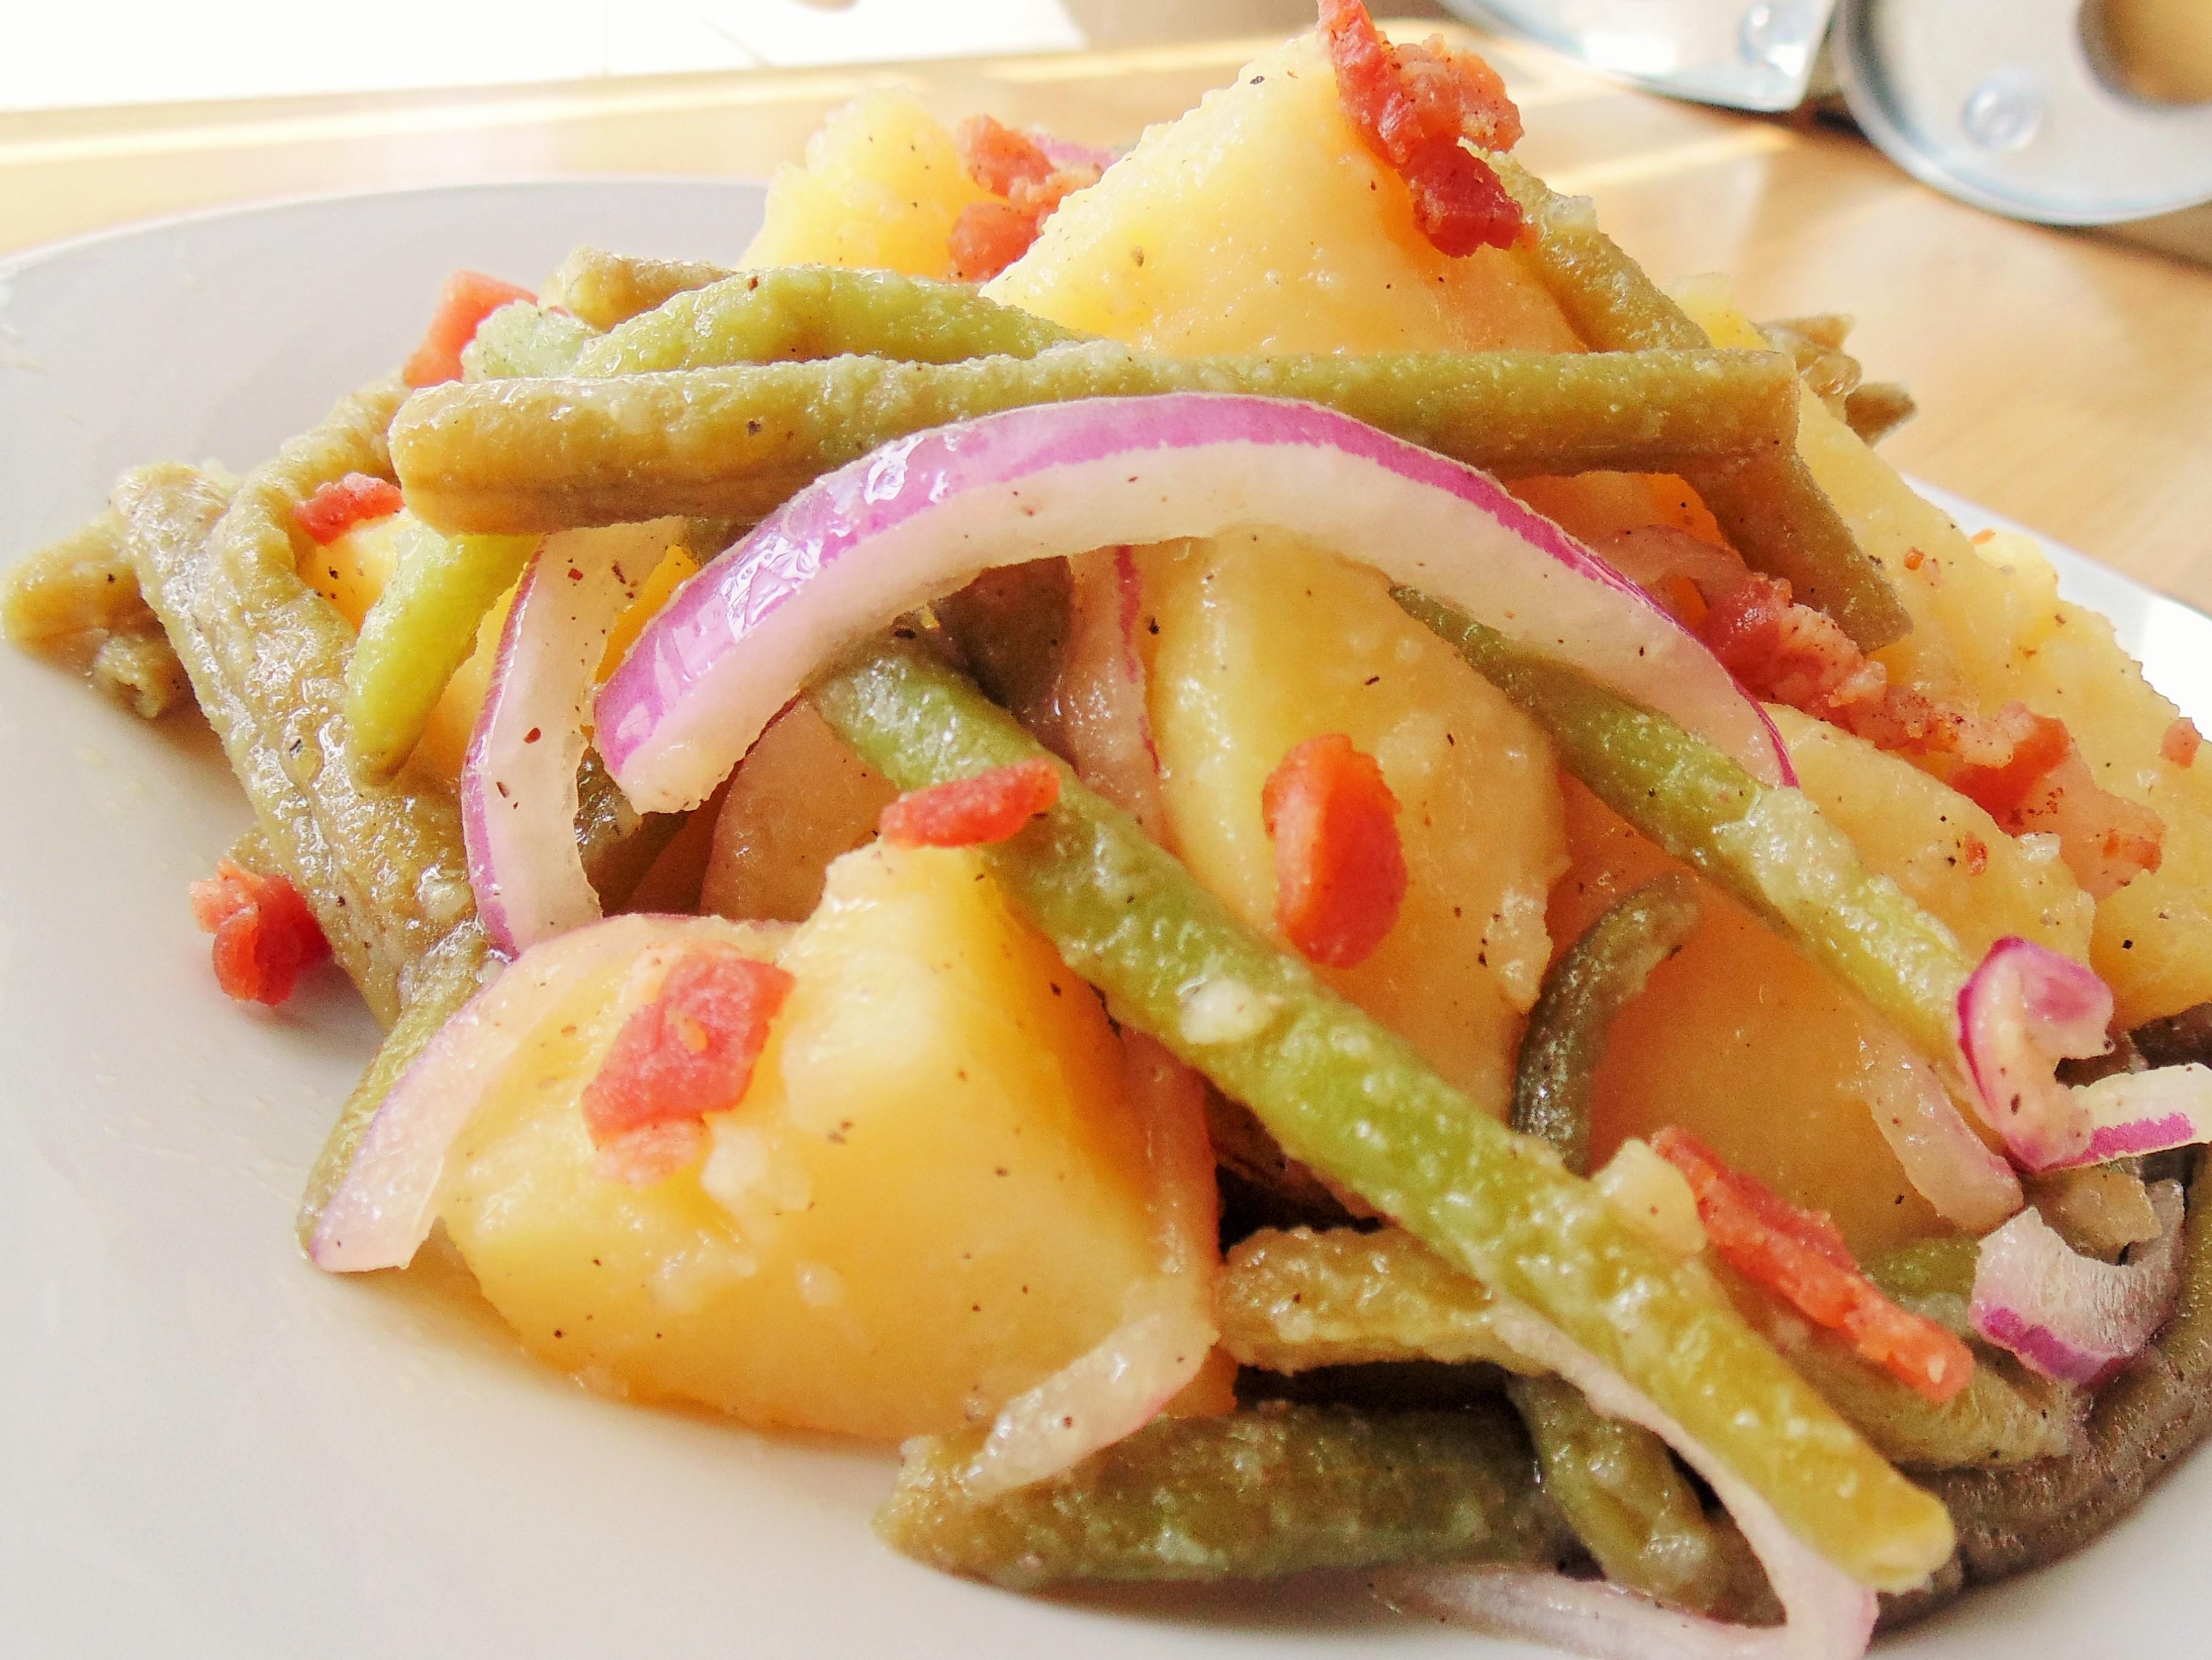 Green Beans and Potato Salad